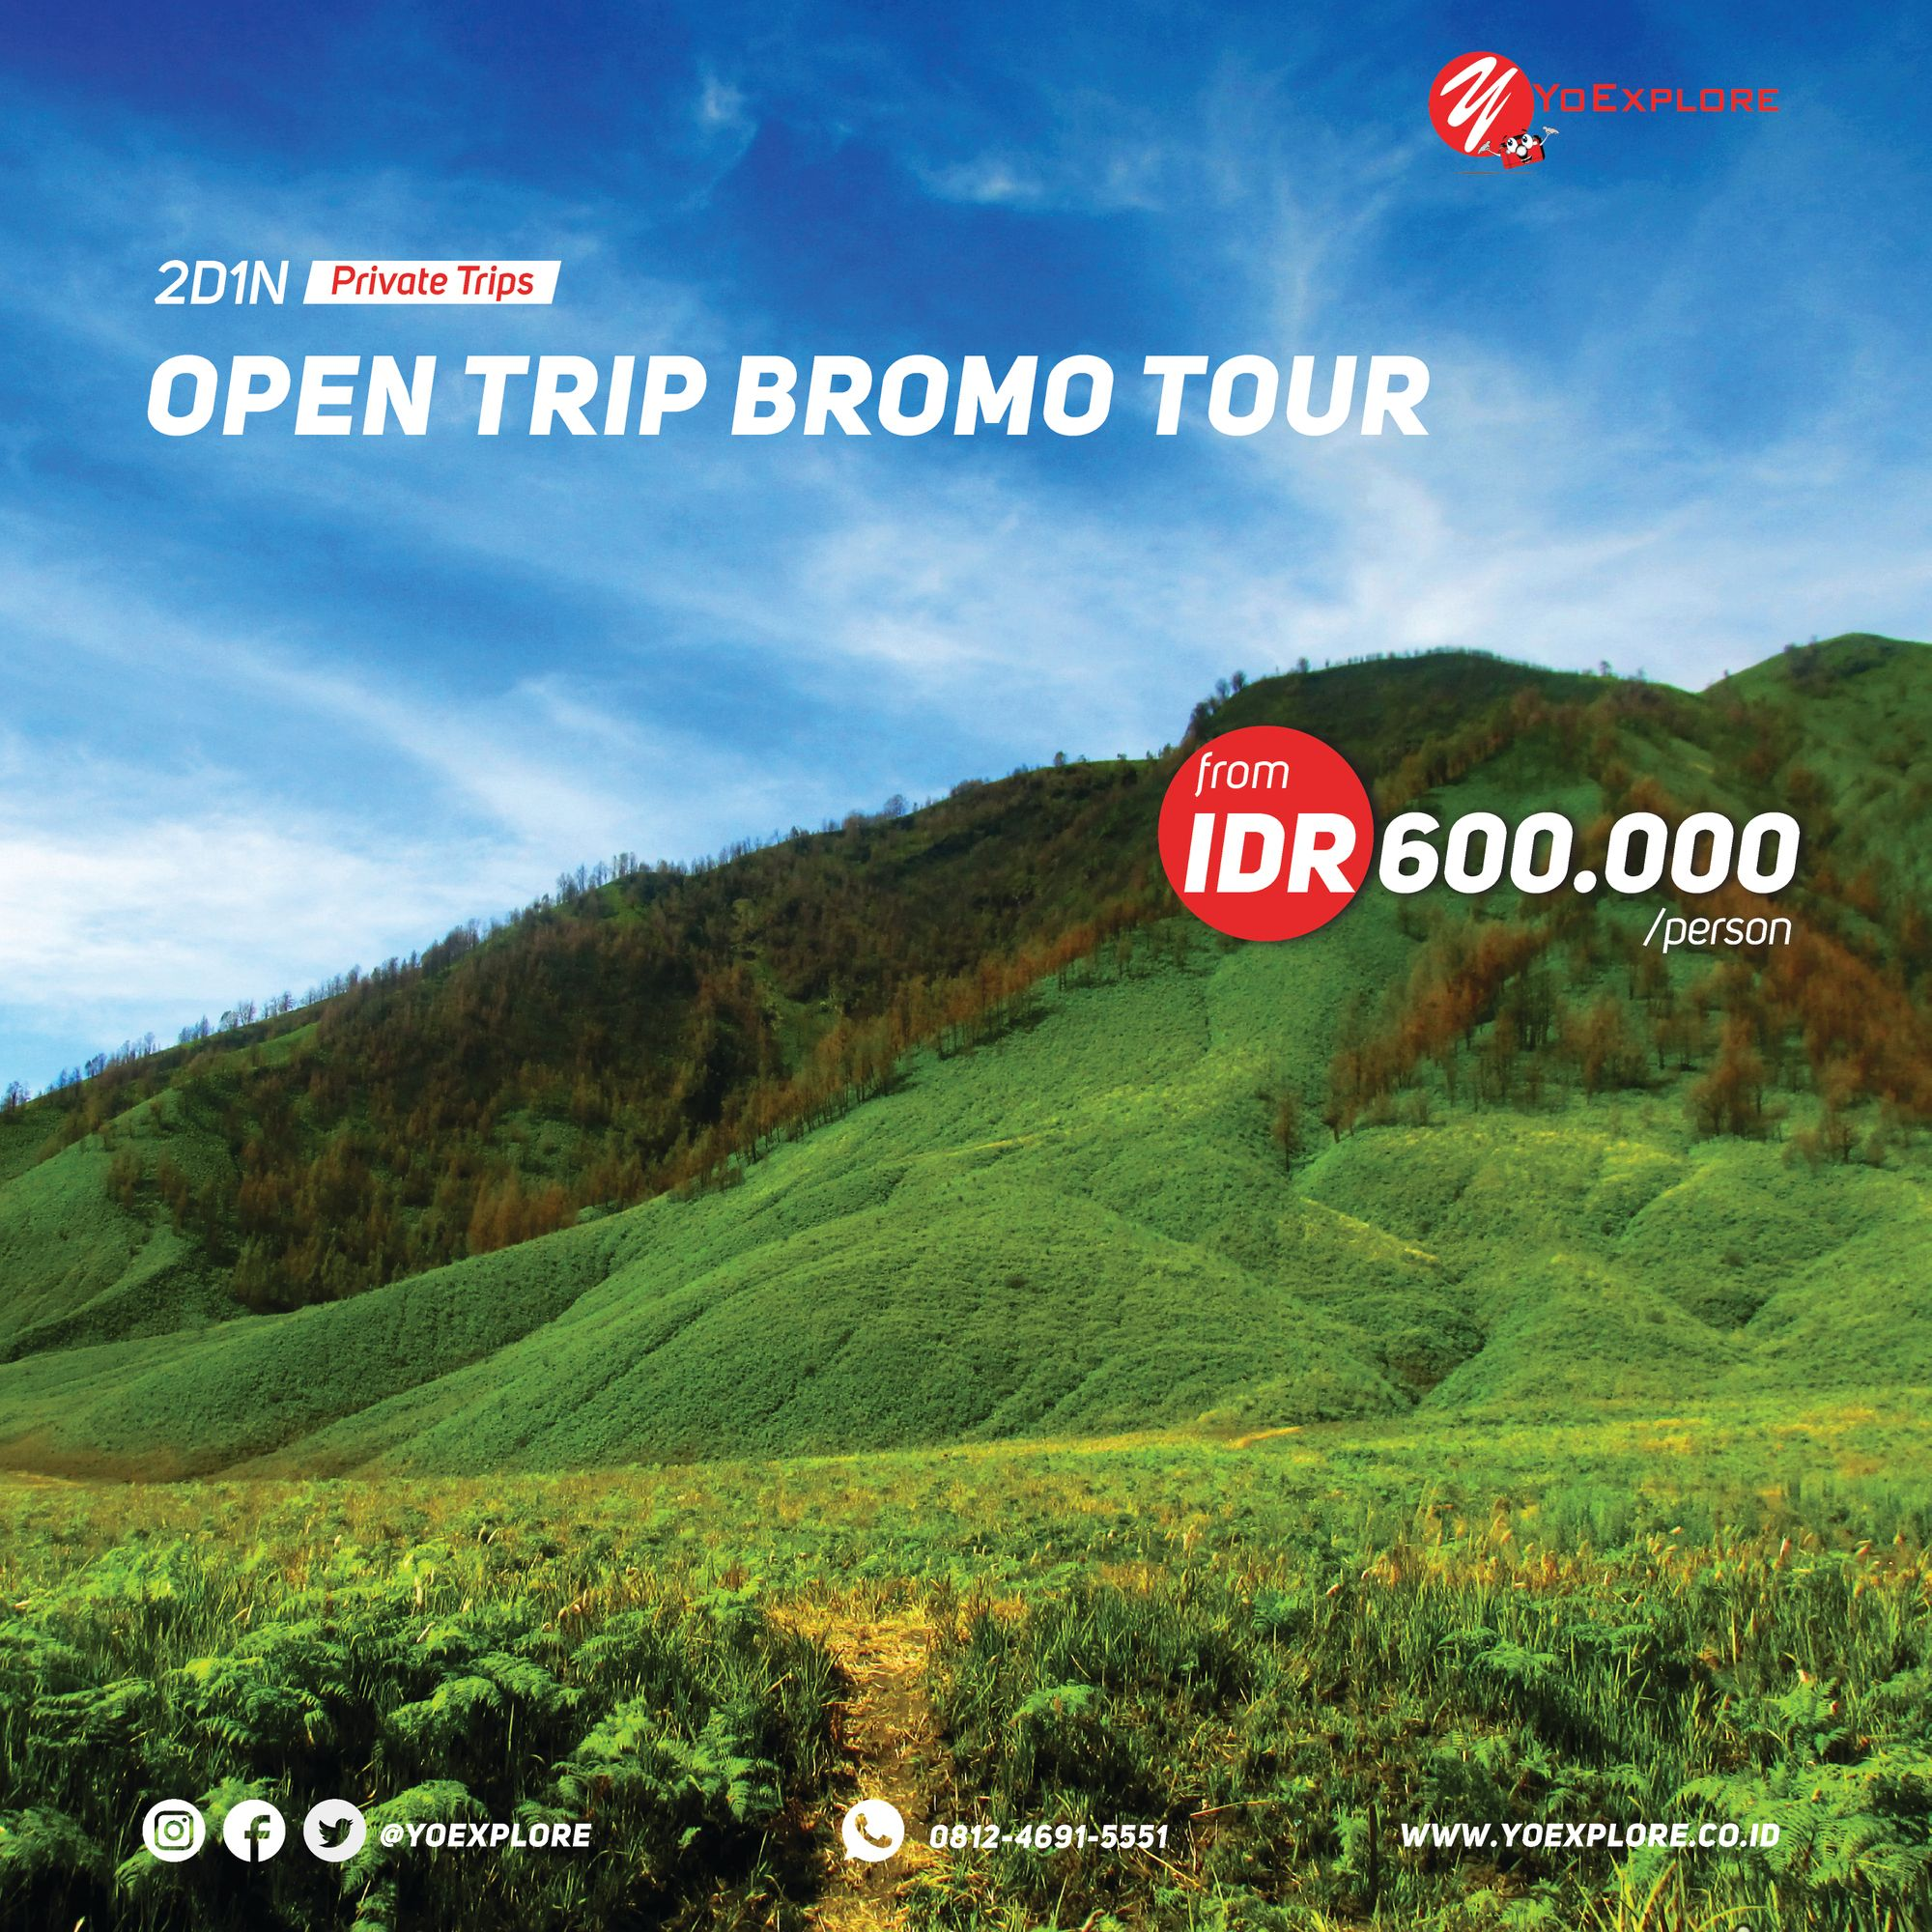 Indonesian Open Trip Bromo Tour Packages From Surabaya Malang Matahari Terbit Pemandangan Villa